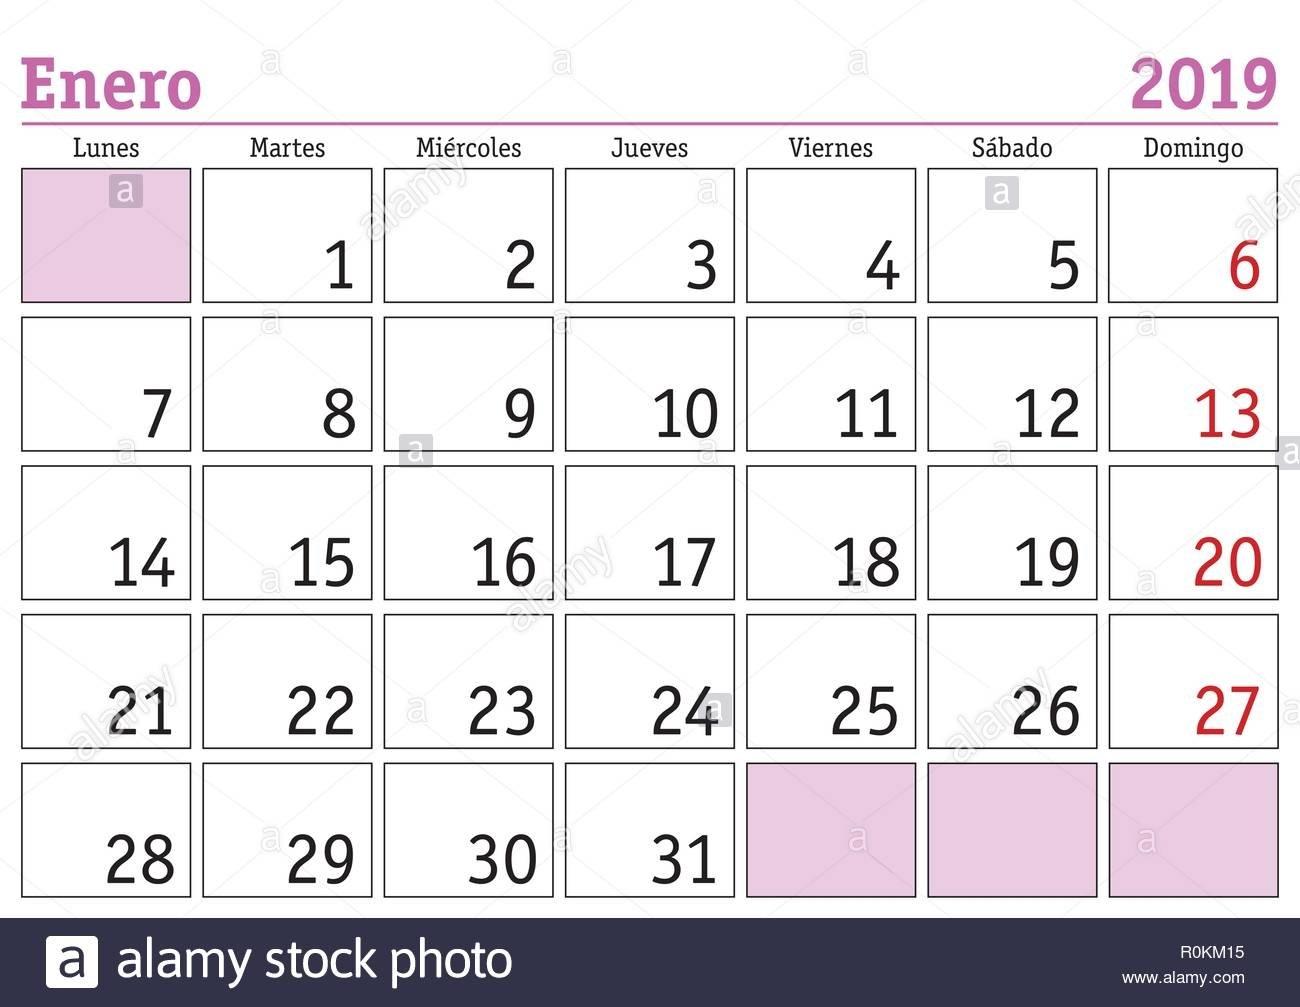 January Month In A Year 2019 Wall Calendar In Spanish. Enero 2019 Calendar 2019 Enero